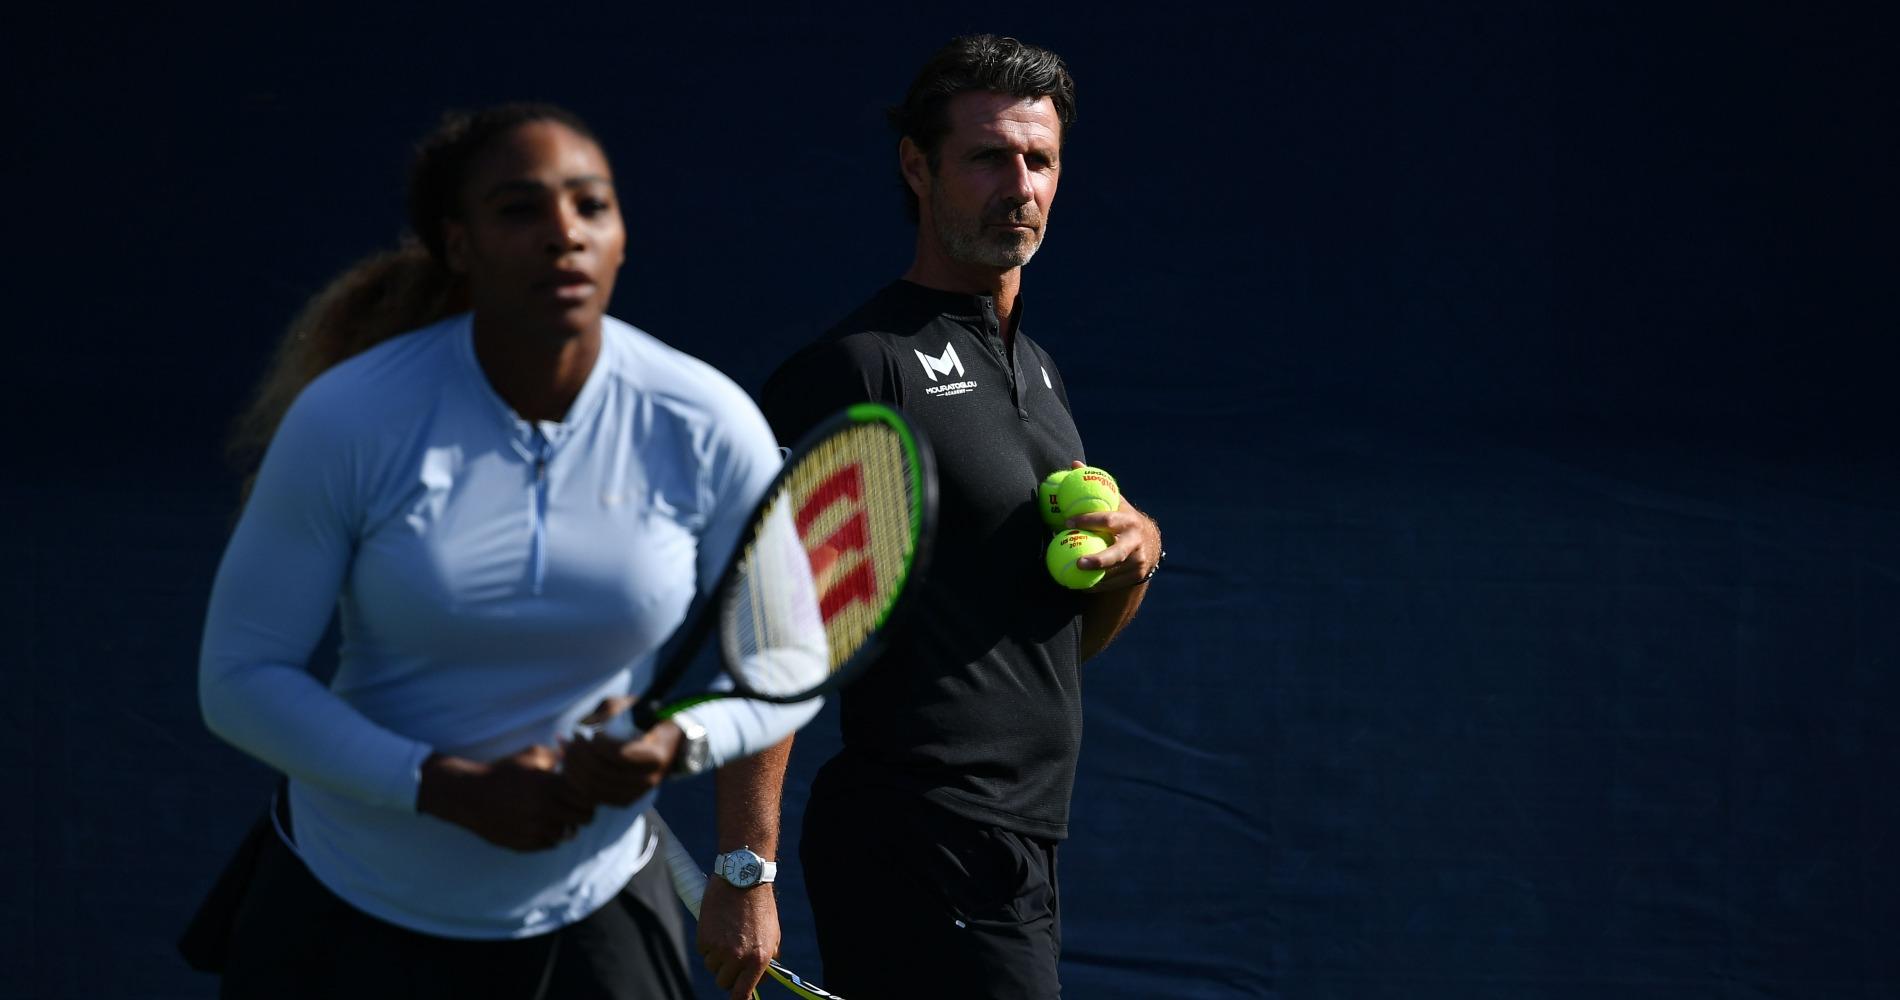 Patrick Mouratoglou and Serena Williams, 2019 US Open